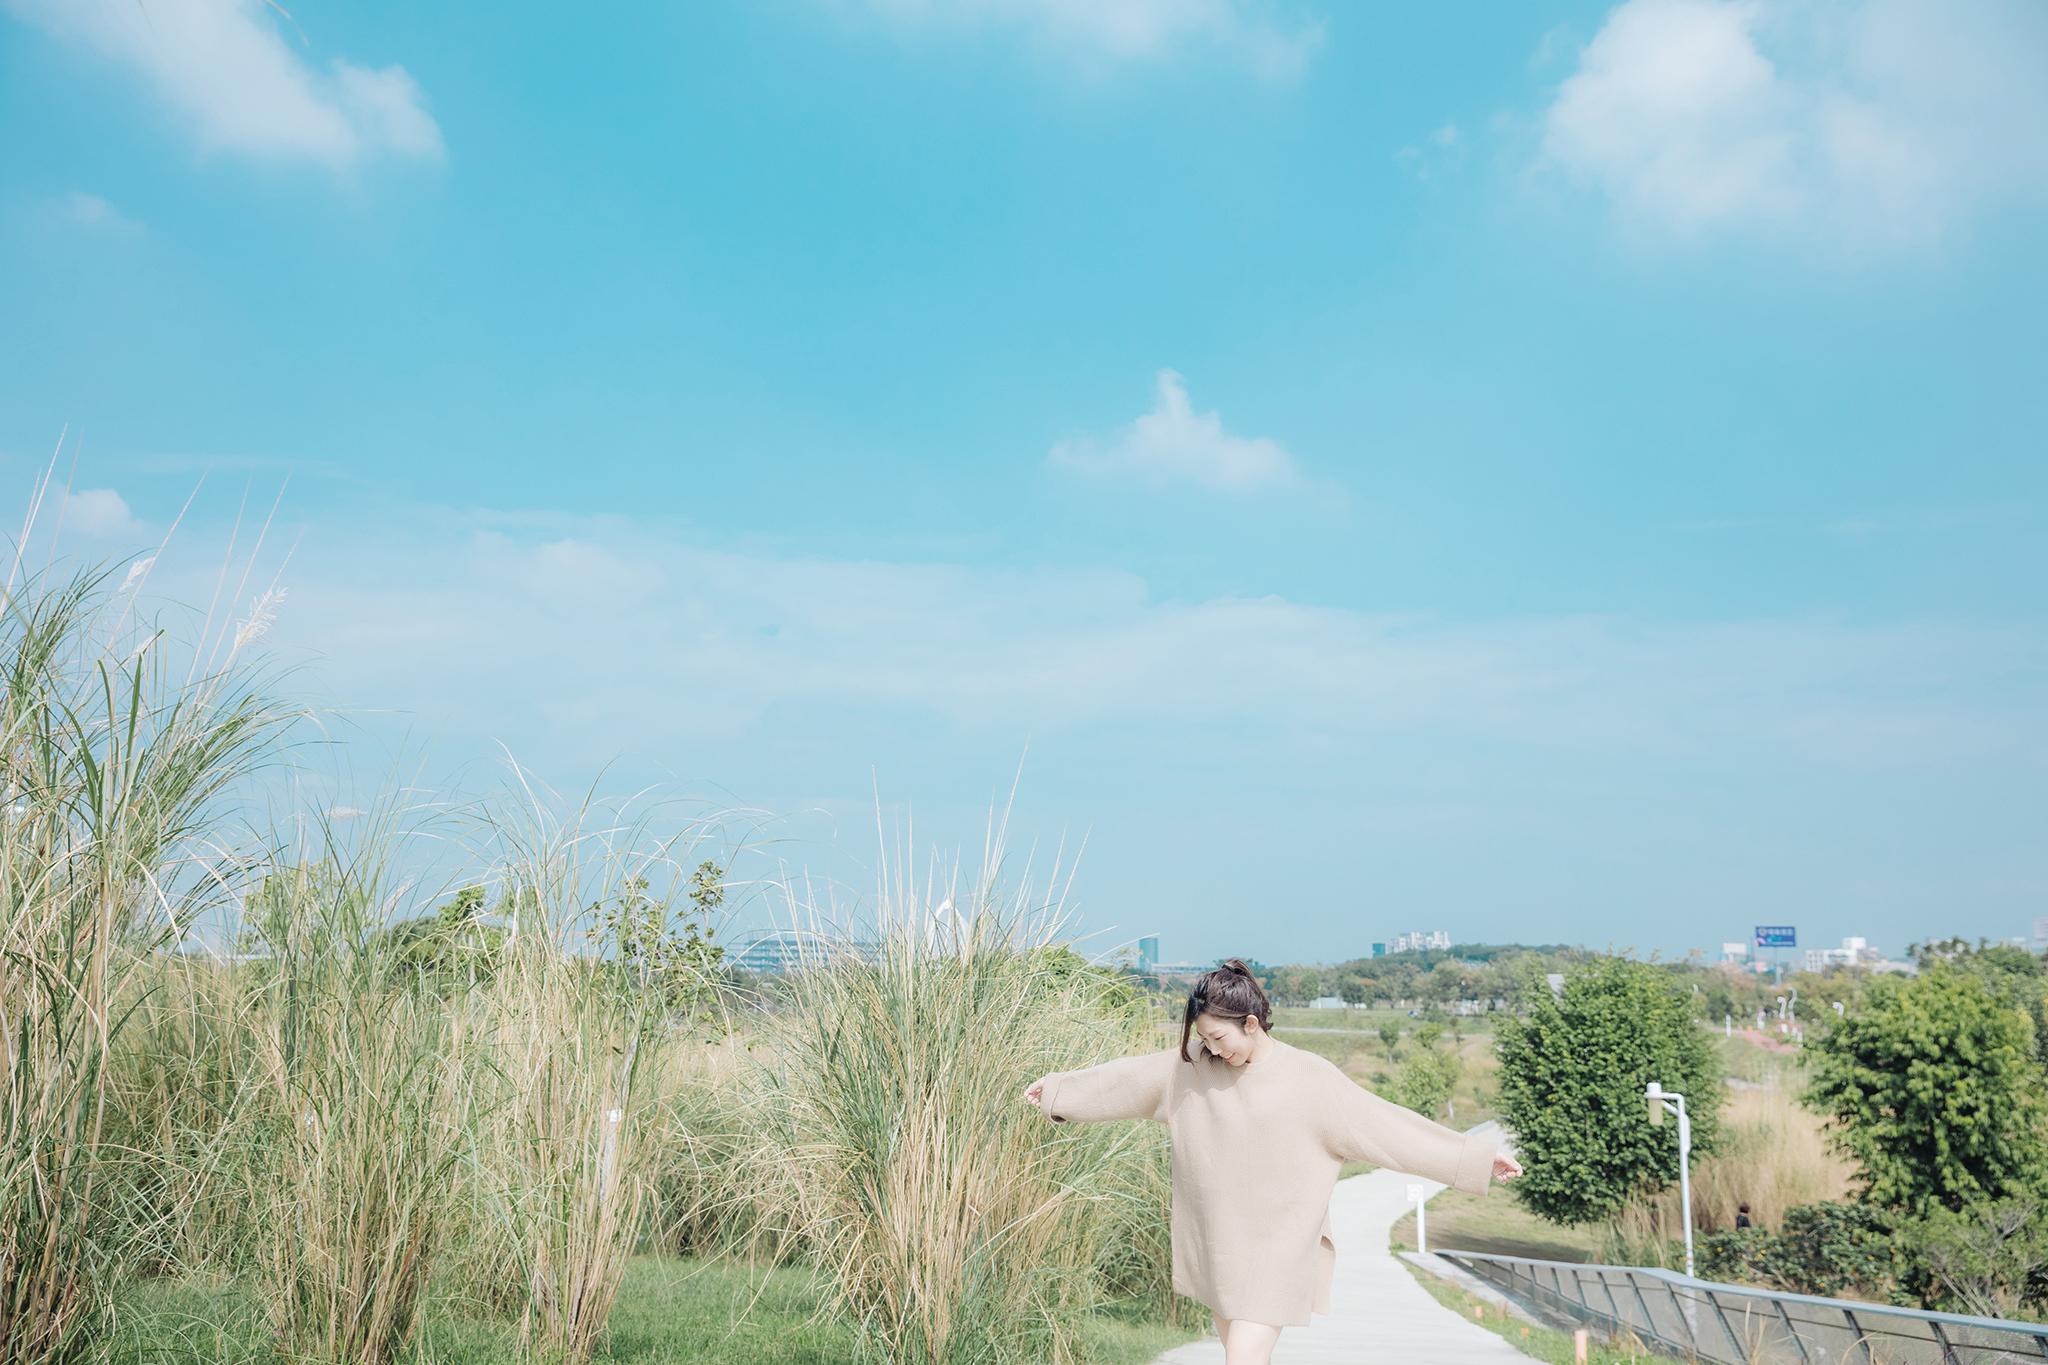 50634899933 eca4b1fee1 o - 【秋季寫真】+Shan+